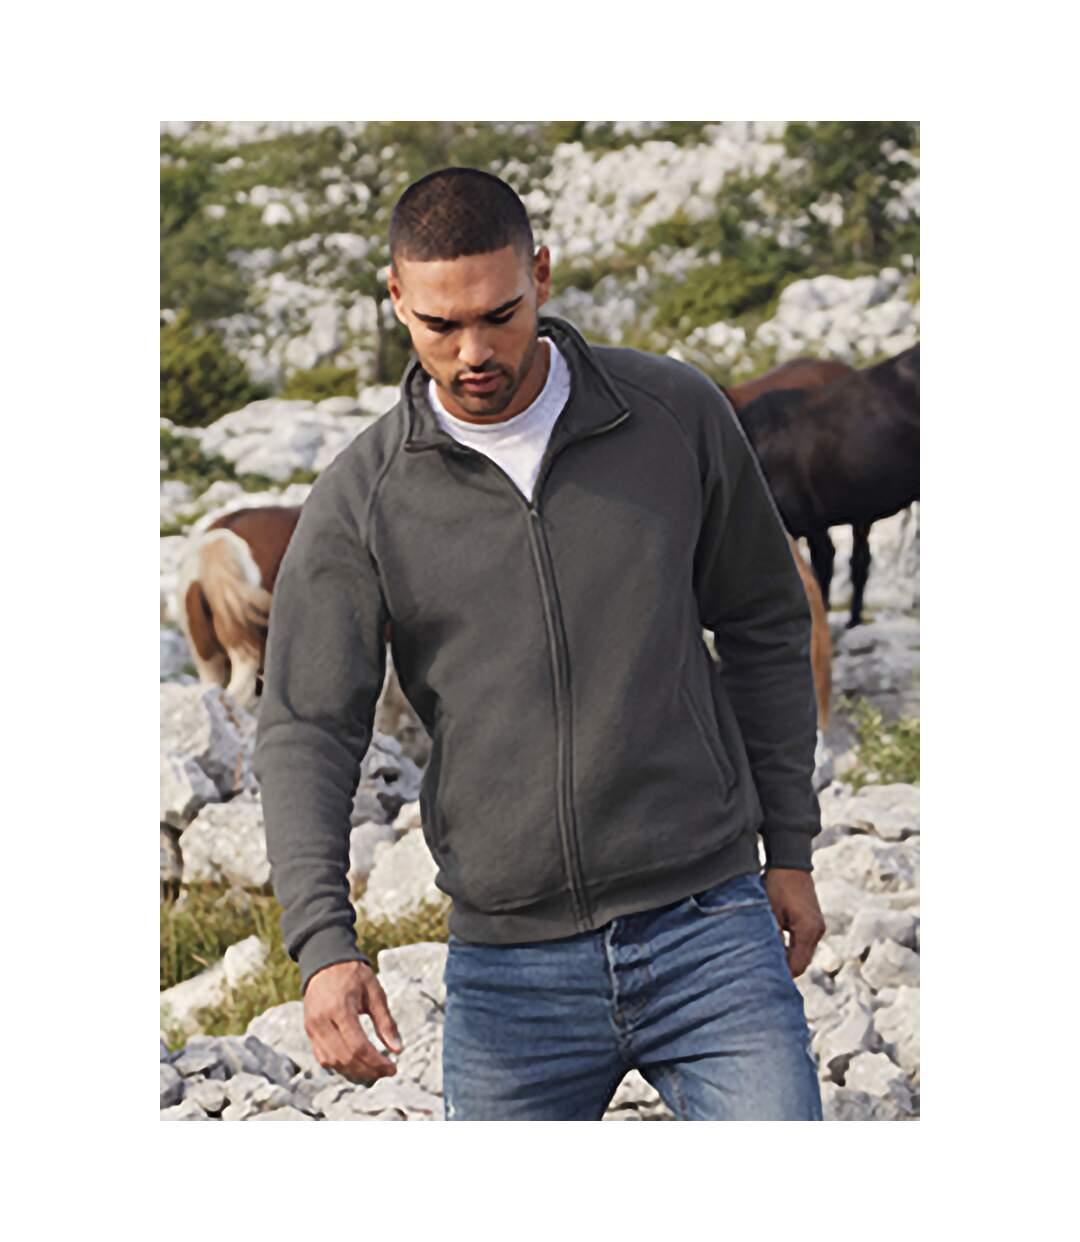 Fruit Of The Loom Mens Sweatshirt Jacket (Light Graphite) - UTBC1375